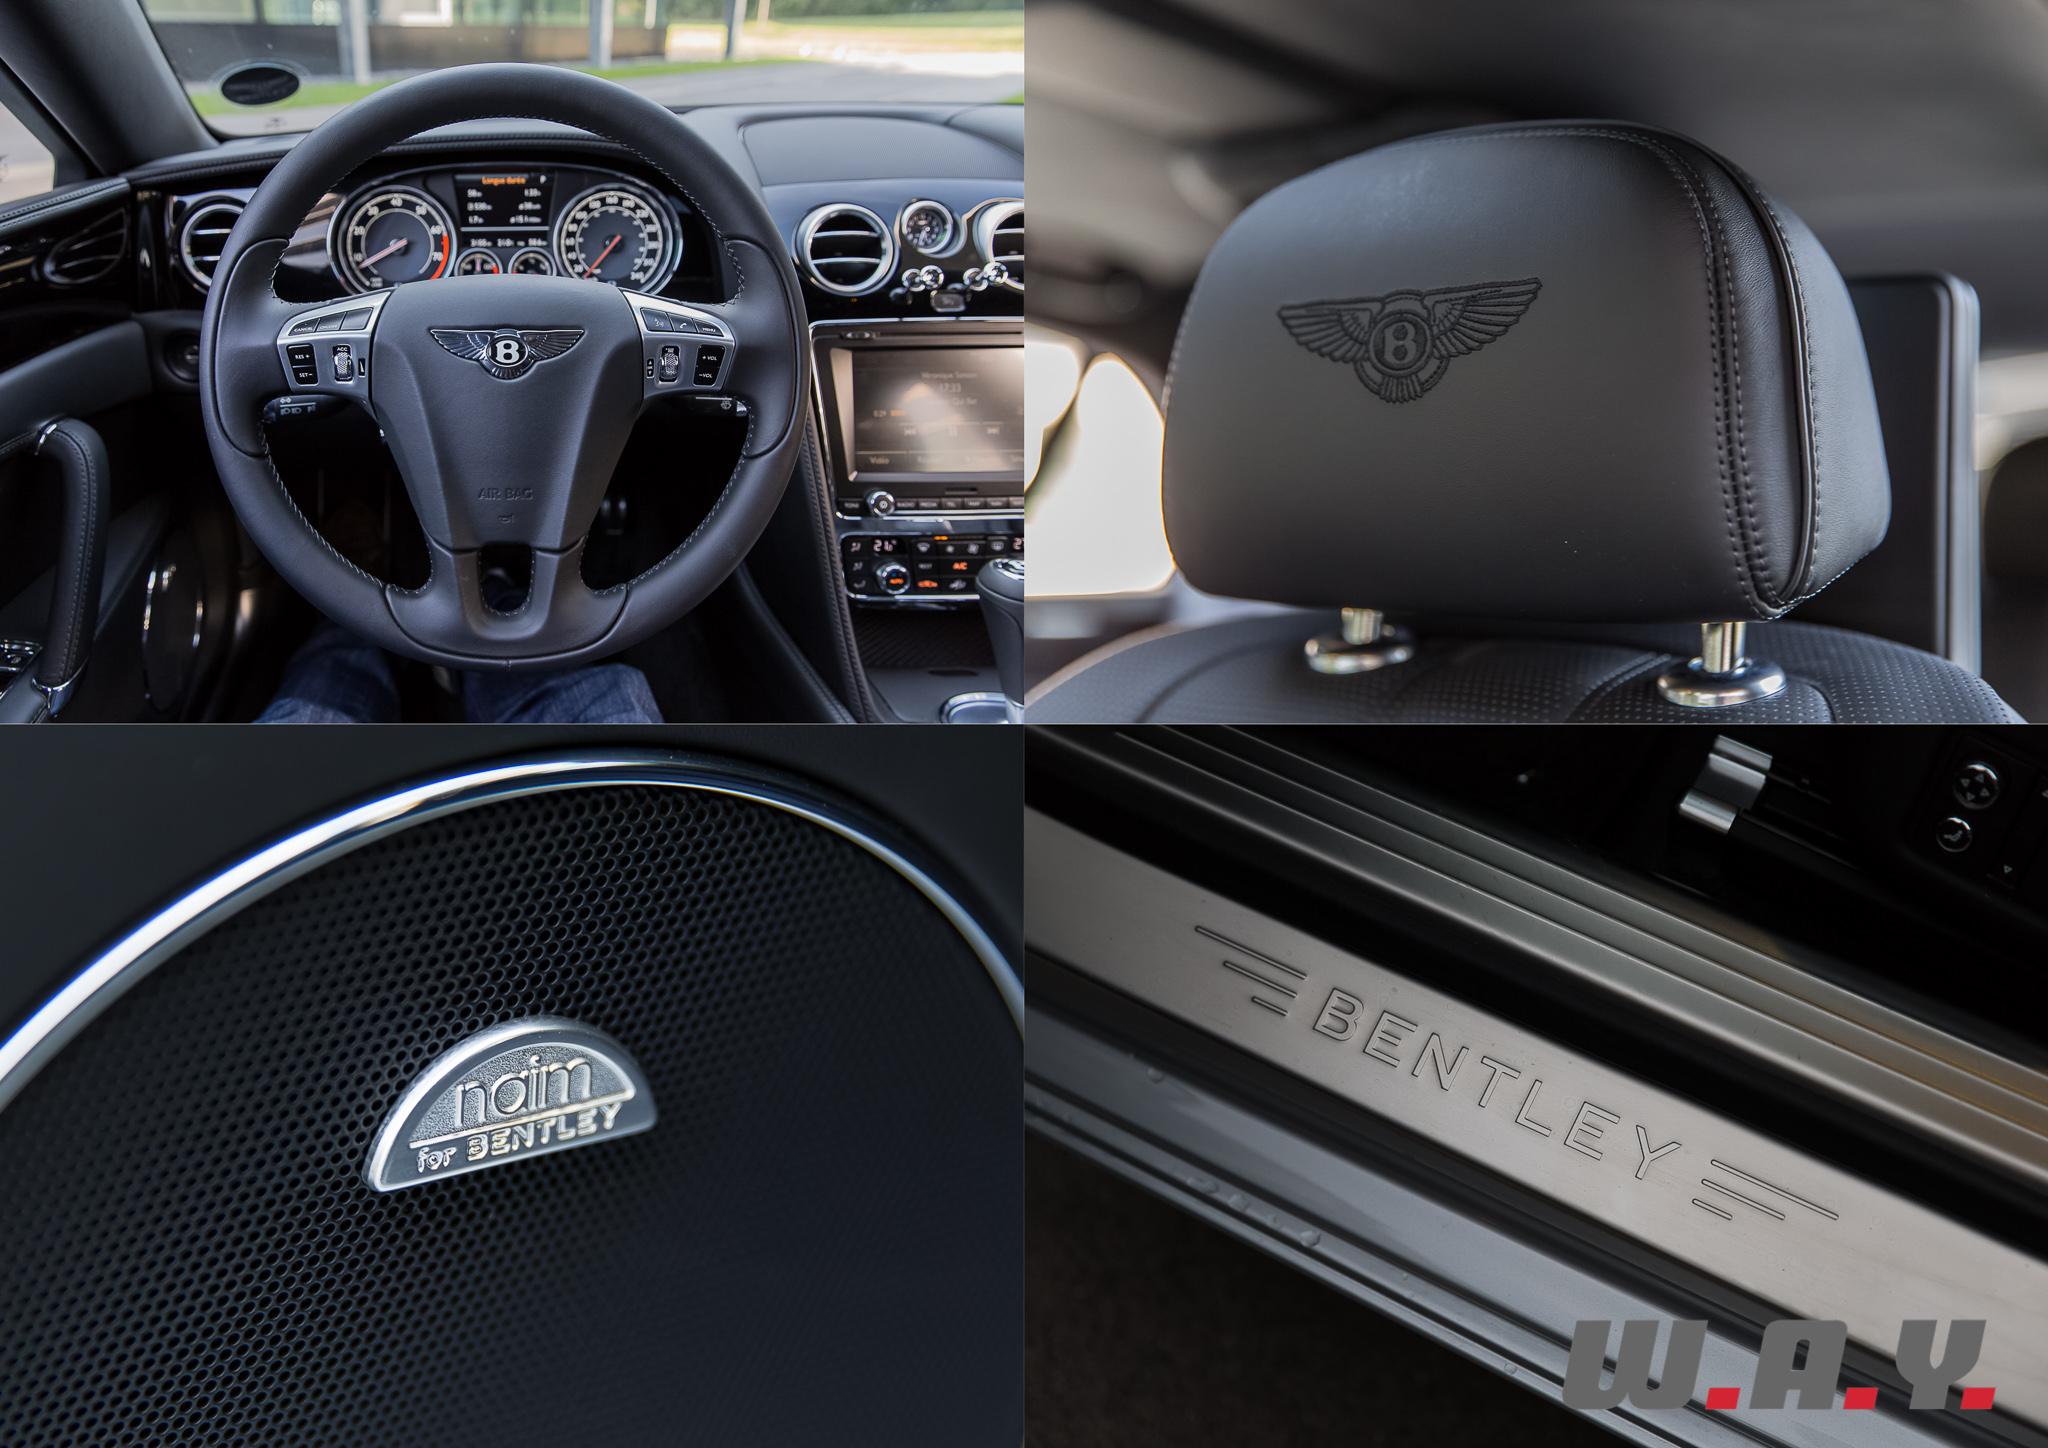 BentleyFlyingSpurV8-4